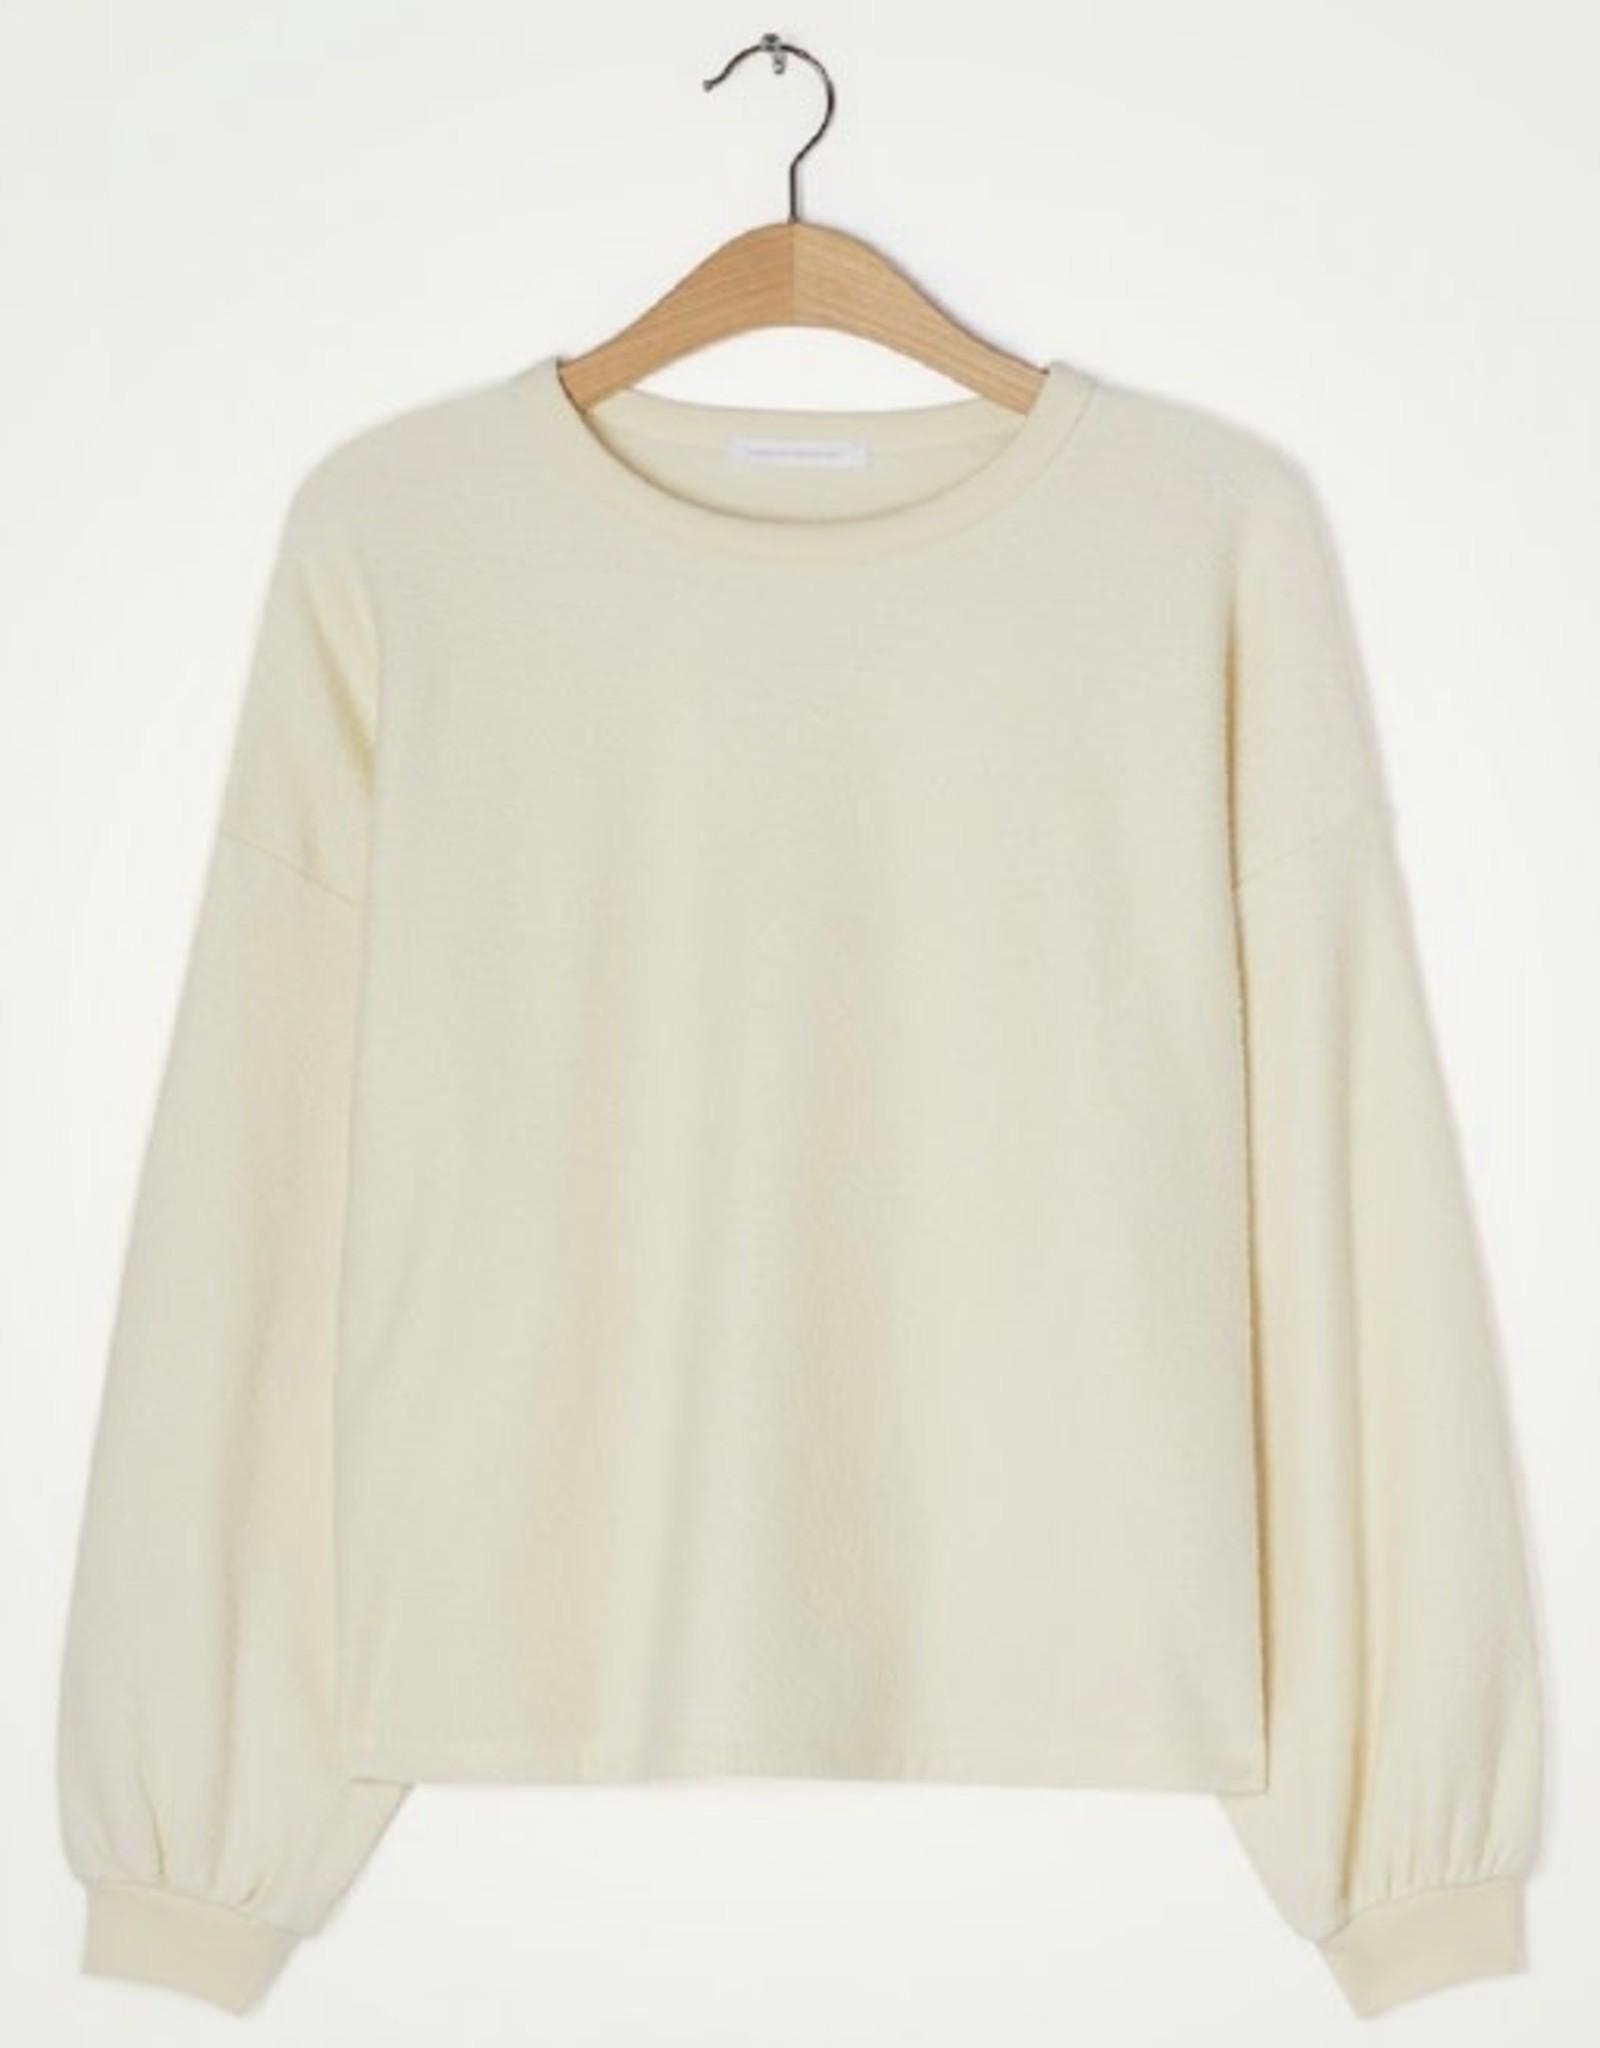 American Vintage Pull/Sweater 'Bobypark' - Ecru - American Vintage